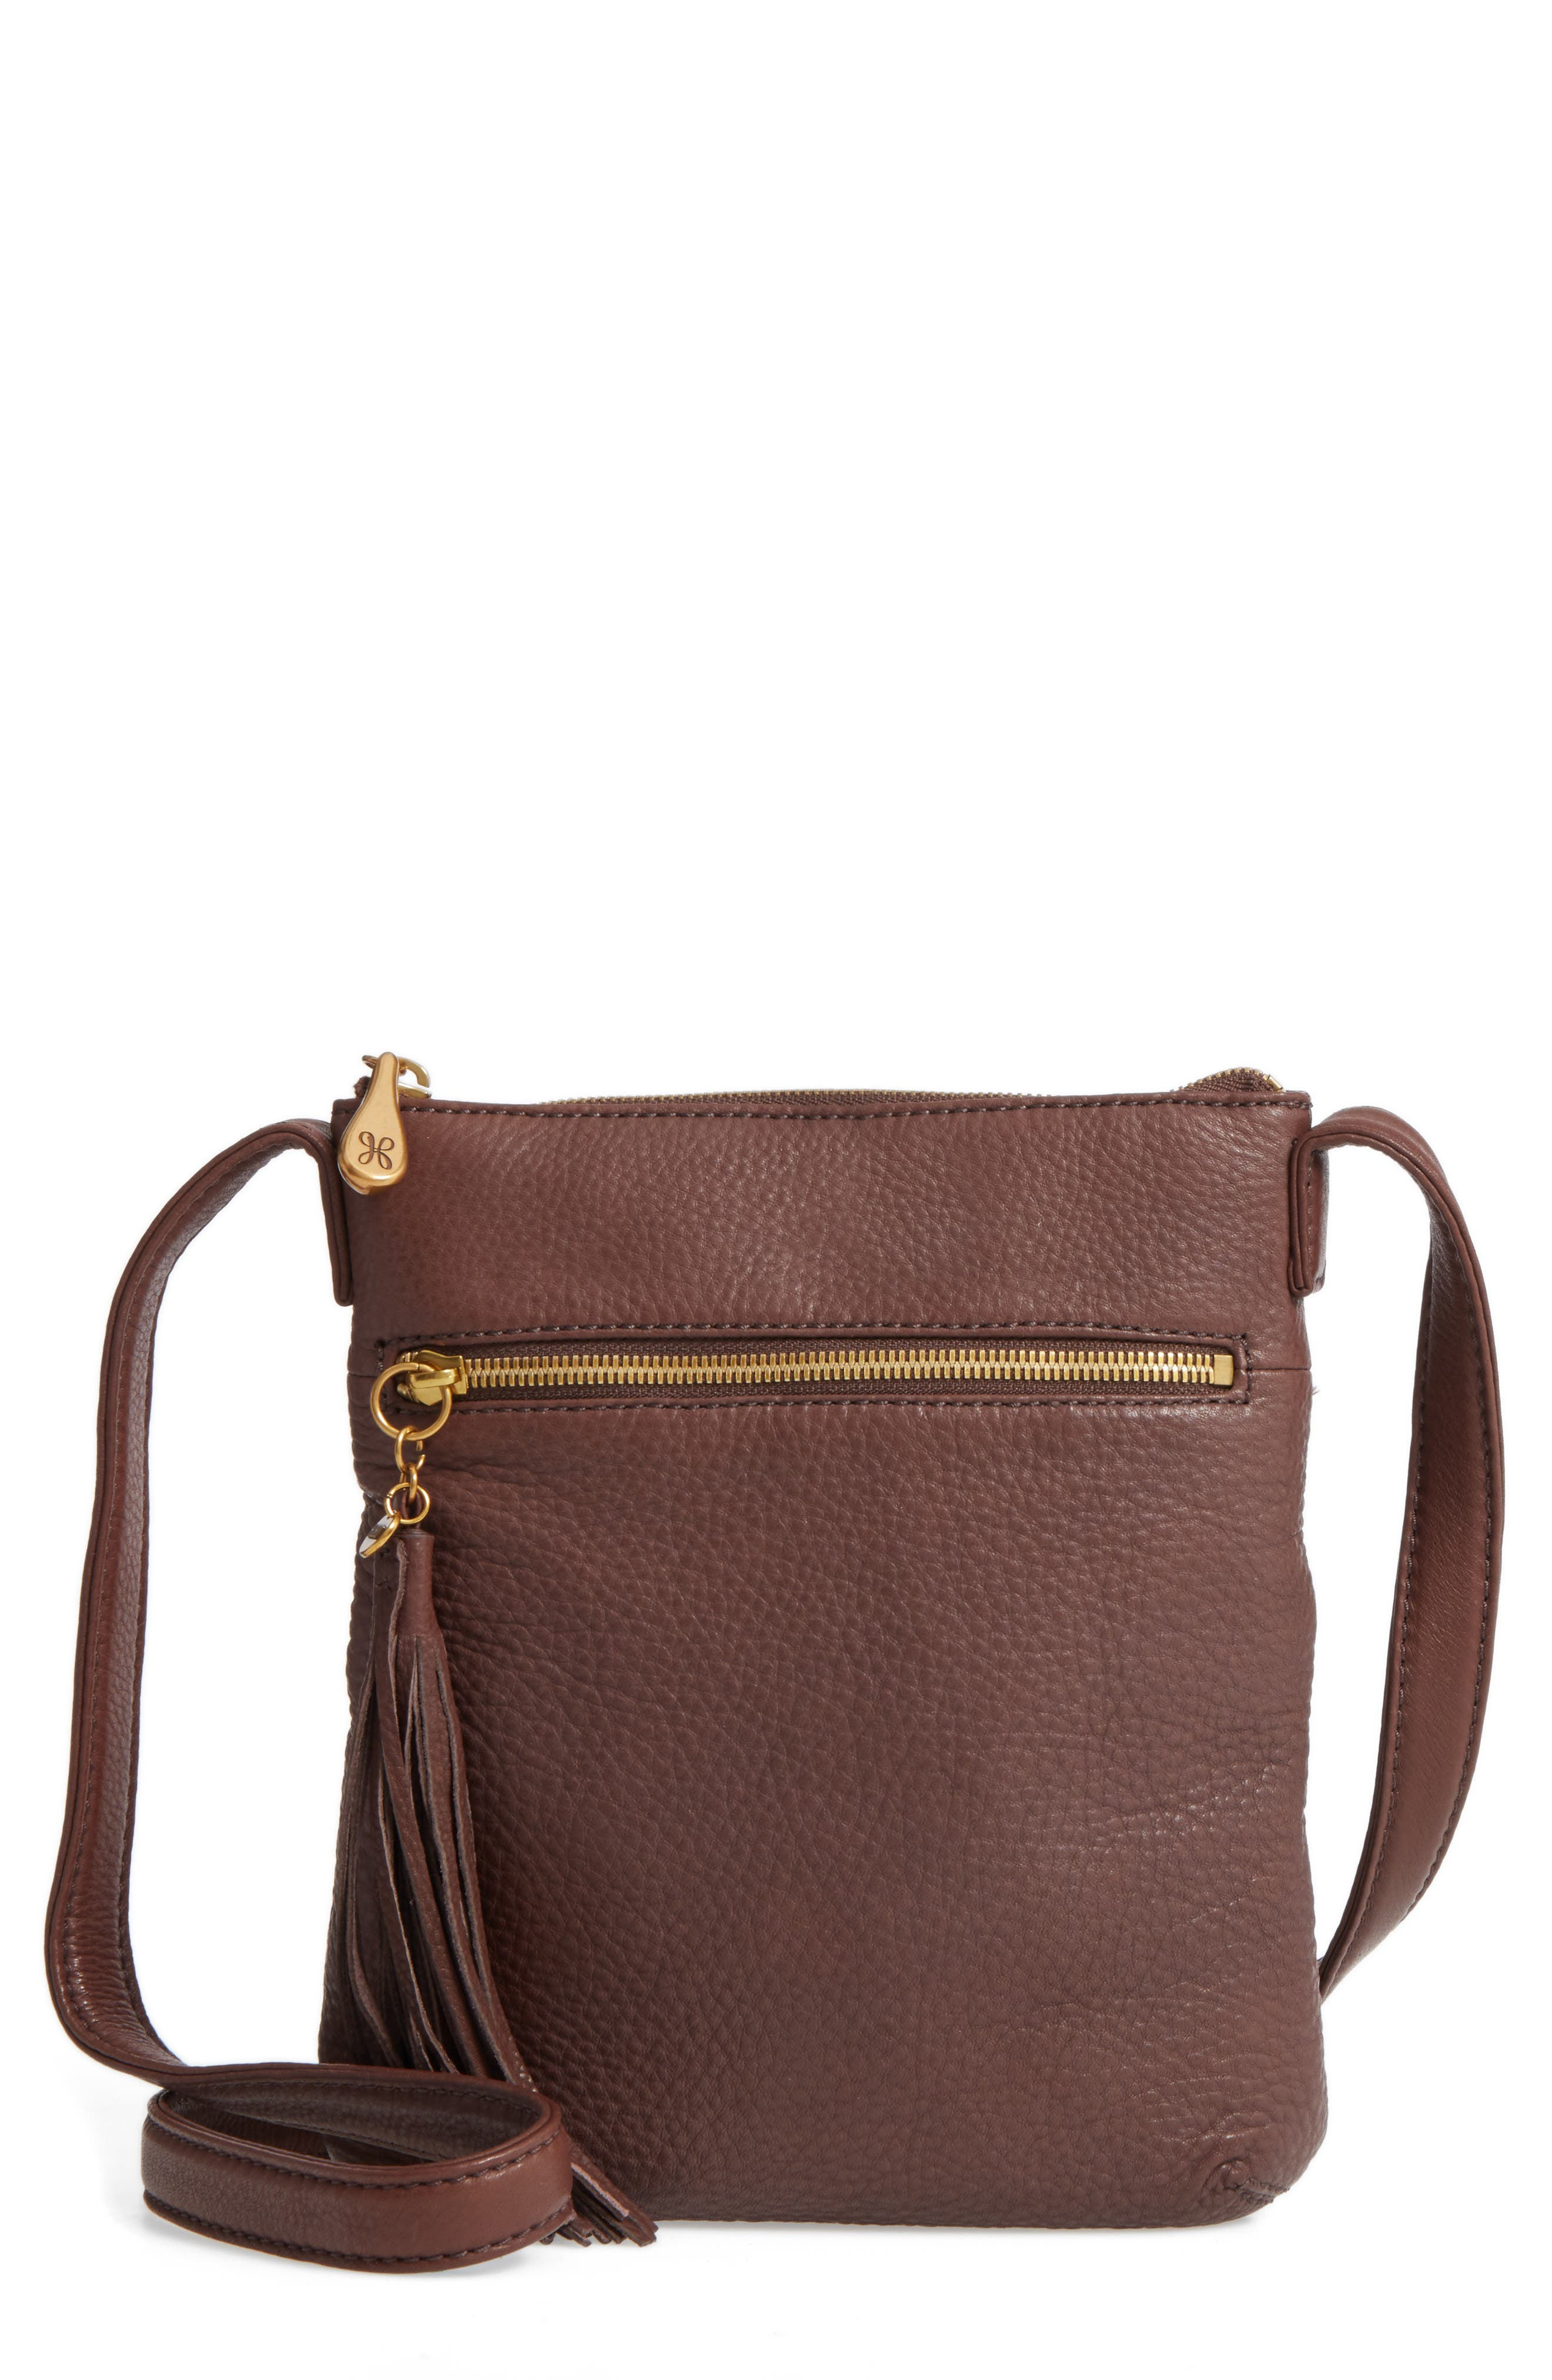 'Sarah' Leather Crossbody Bag,                             Main thumbnail 4, color,